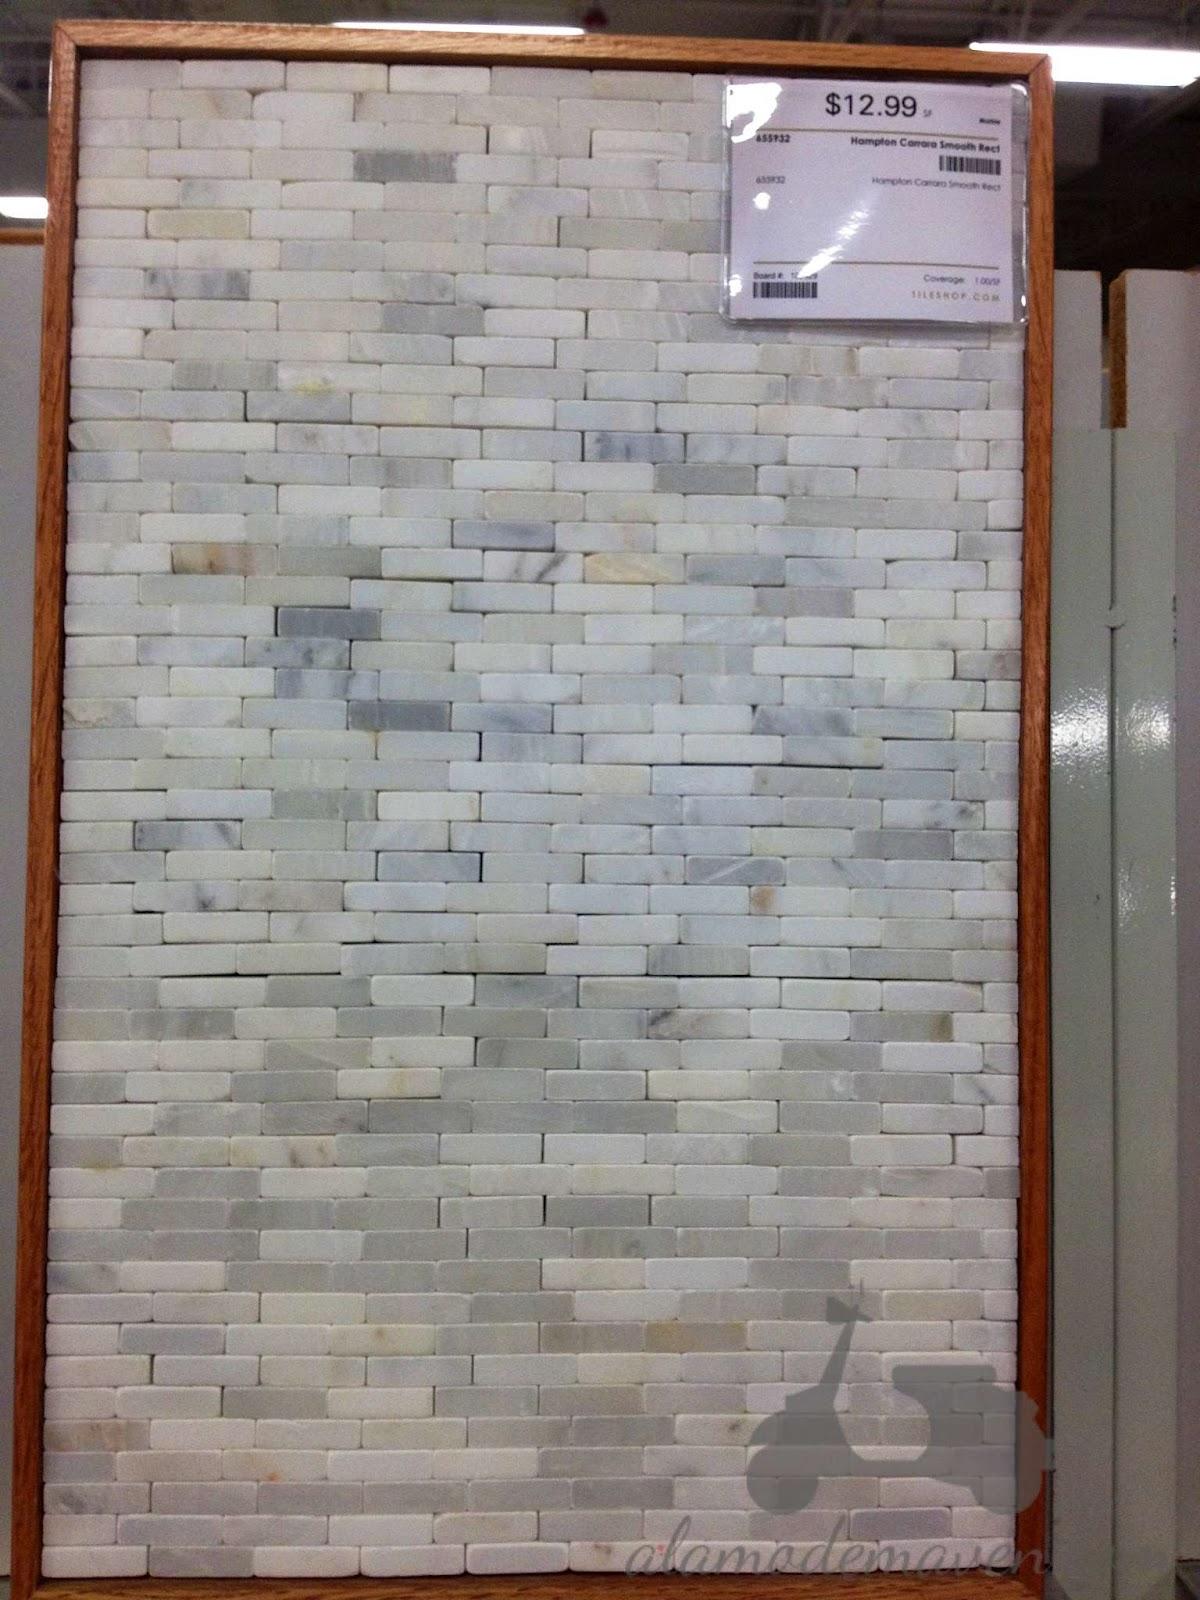 Carrera Marble Backsplash Mosaic - Bestsciaticatreatments.com